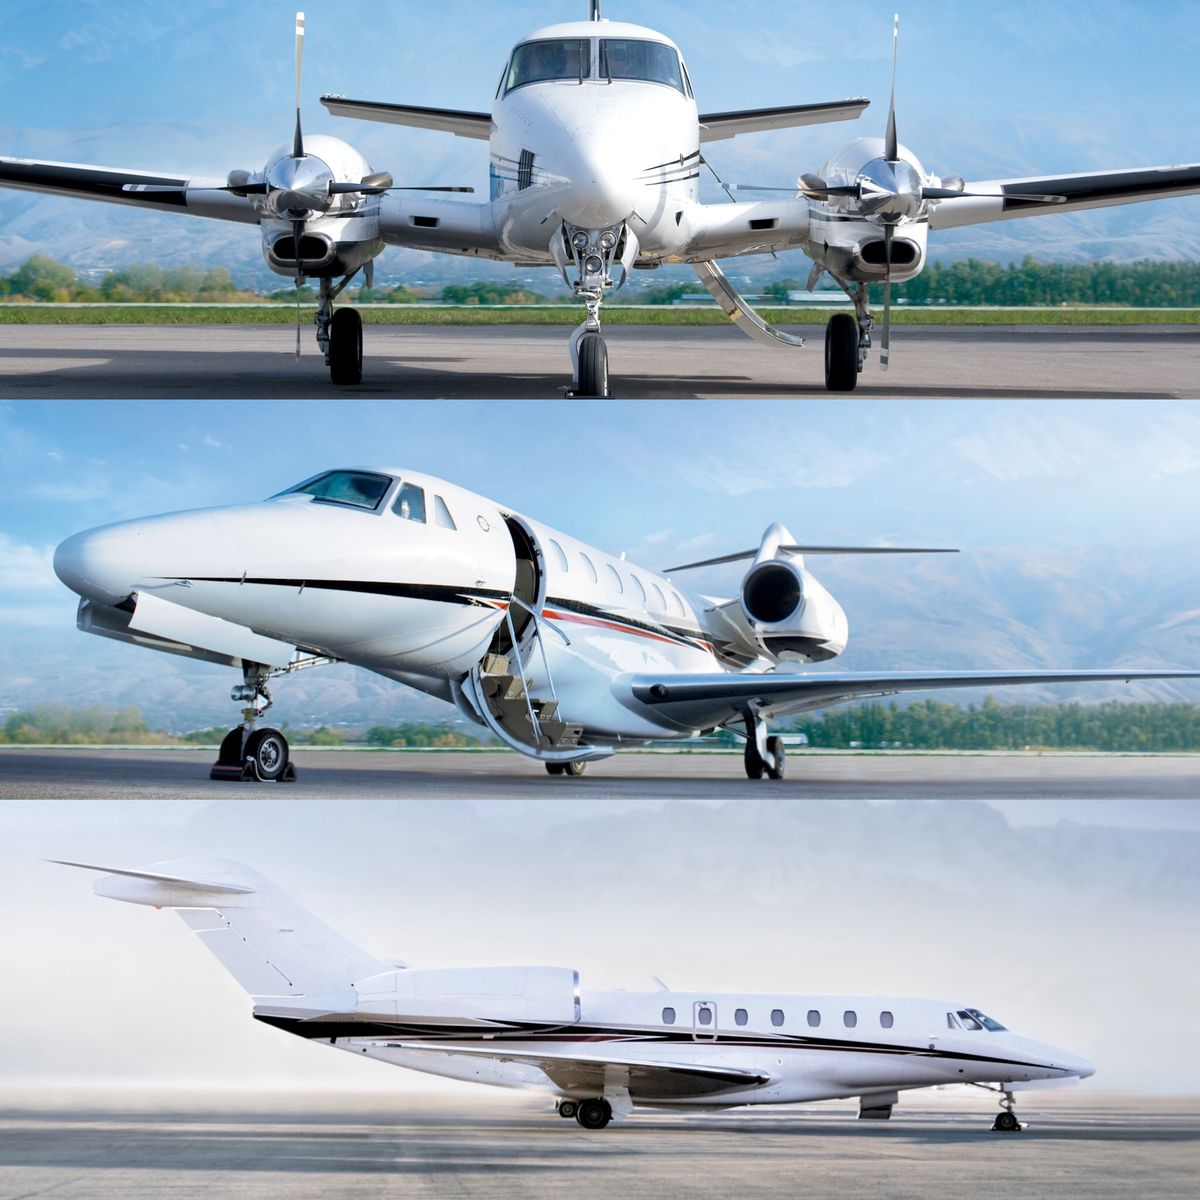 Considering buying an aircraft ?.JPG